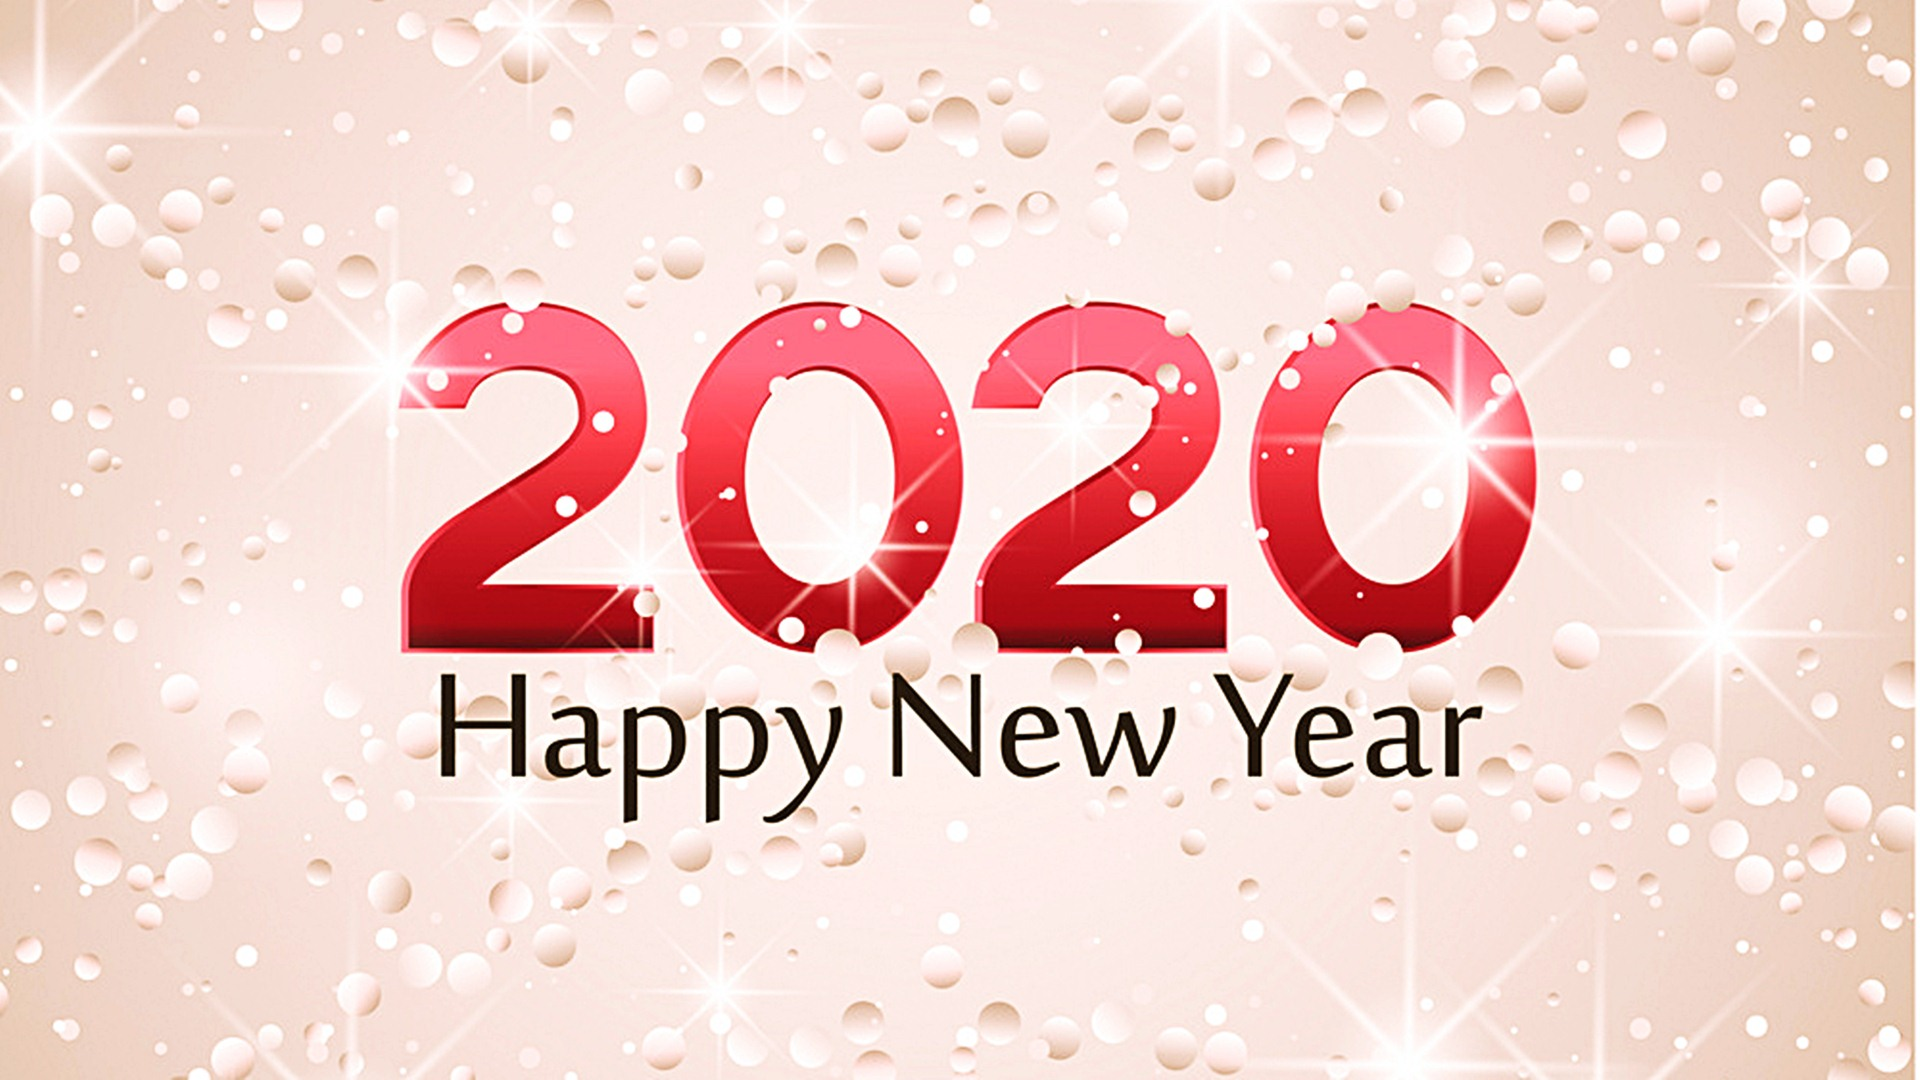 Happy New Year 2020 Wallpaper HD 45554   Baltana 1920x1080